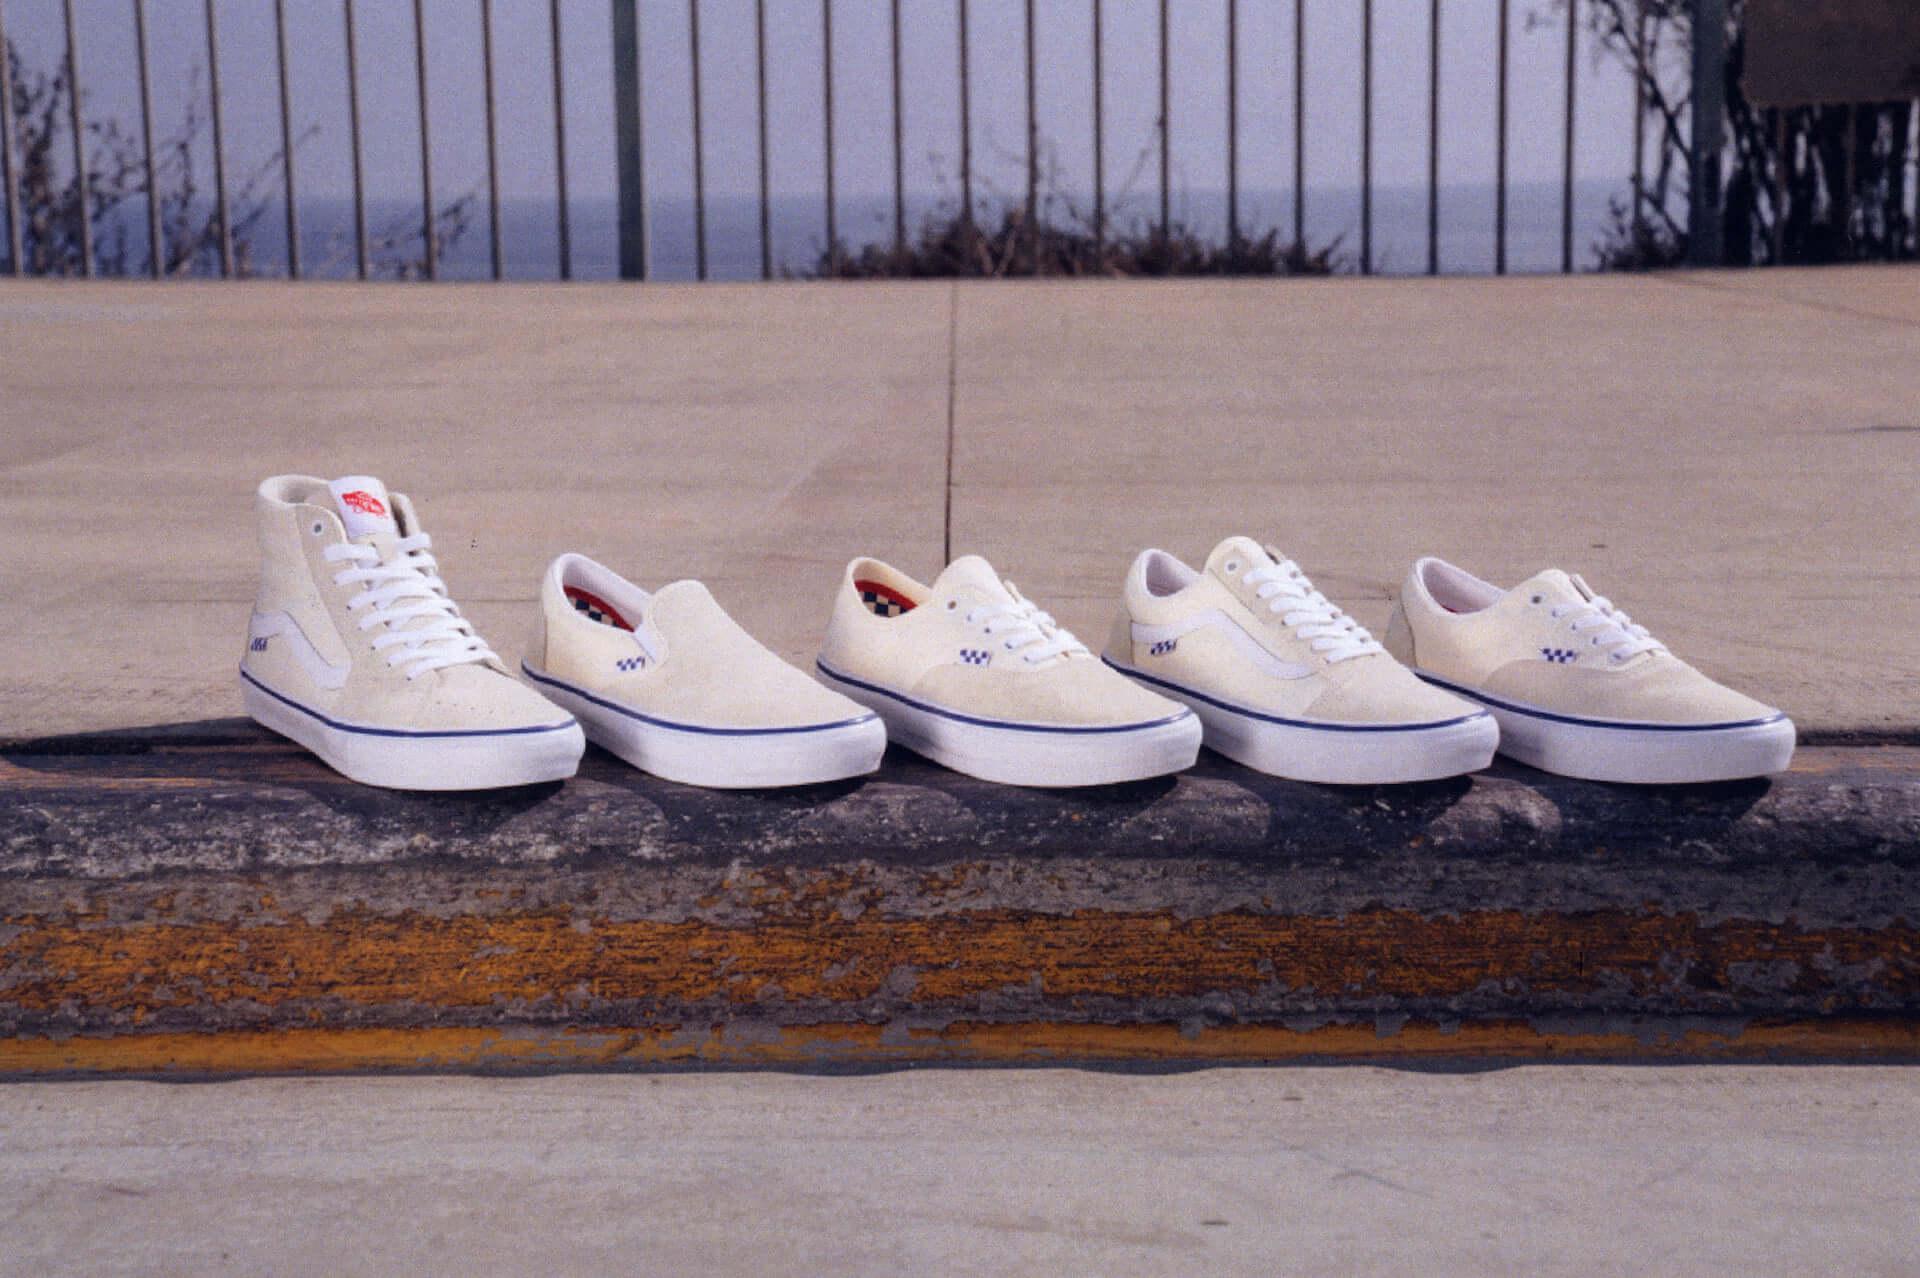 "VANSがスケーターに向けた新コレクション「Skate Classics」を発表!""全てが新しくなった""素材・構造に注目 lf210304_vans_2-1920x1278"